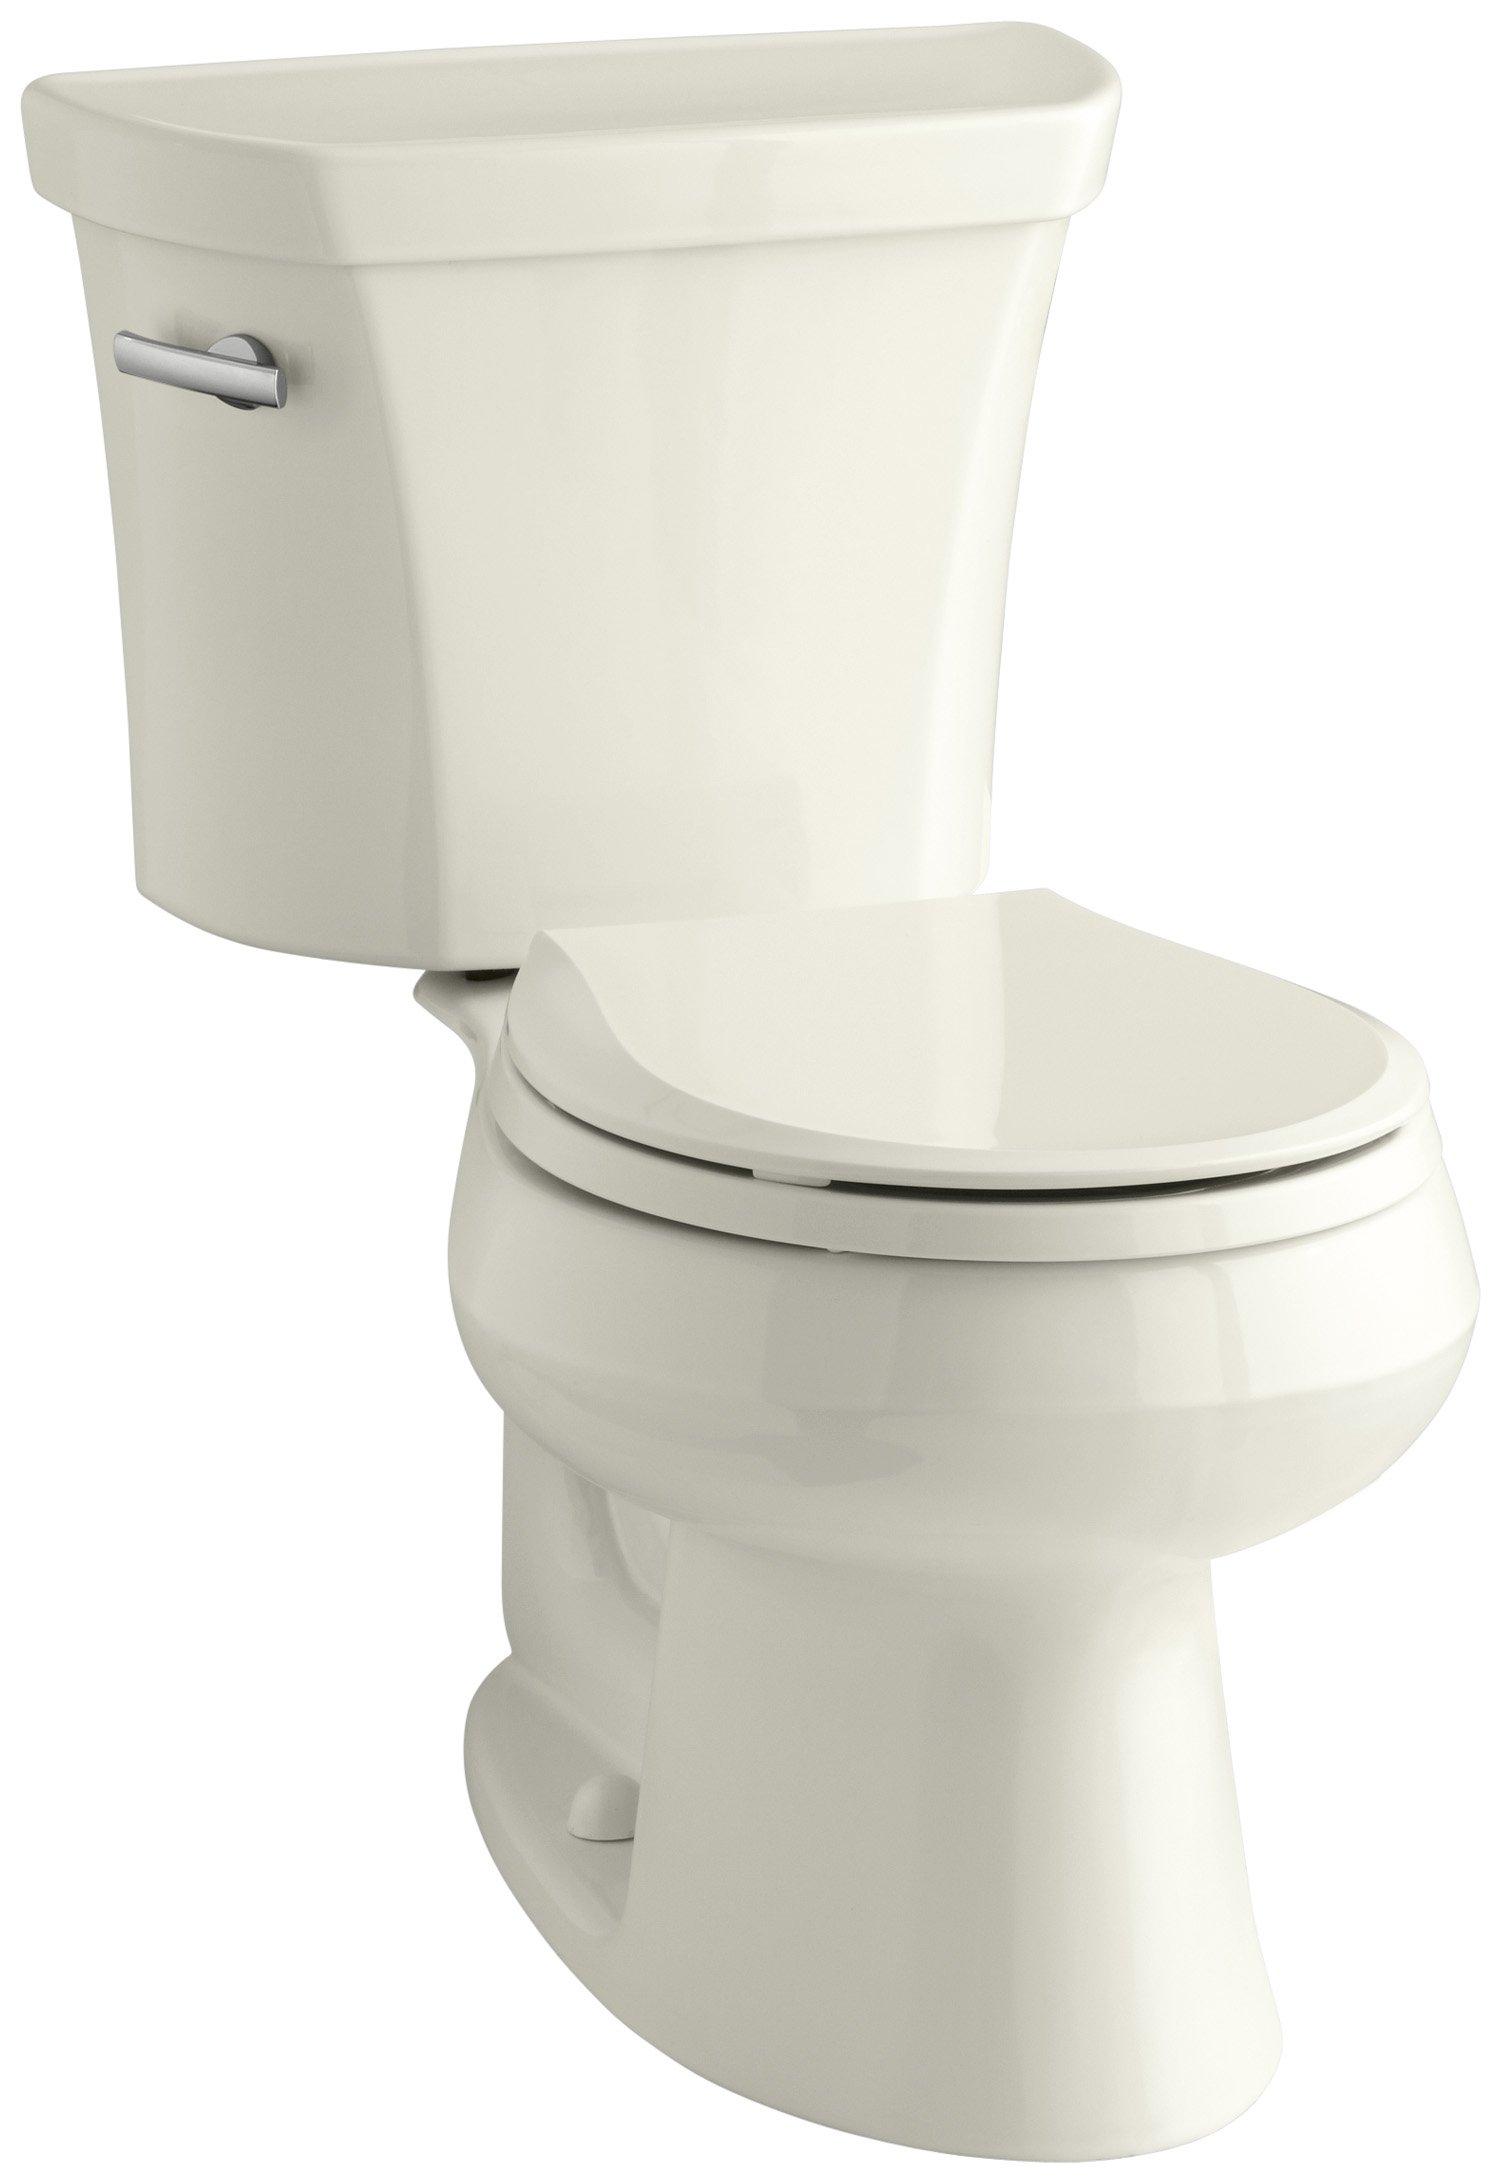 Kohler K-3977-96 Wellworth Round-Front 1.6 gpf Toilet, Biscuit, Less Seat by Kohler